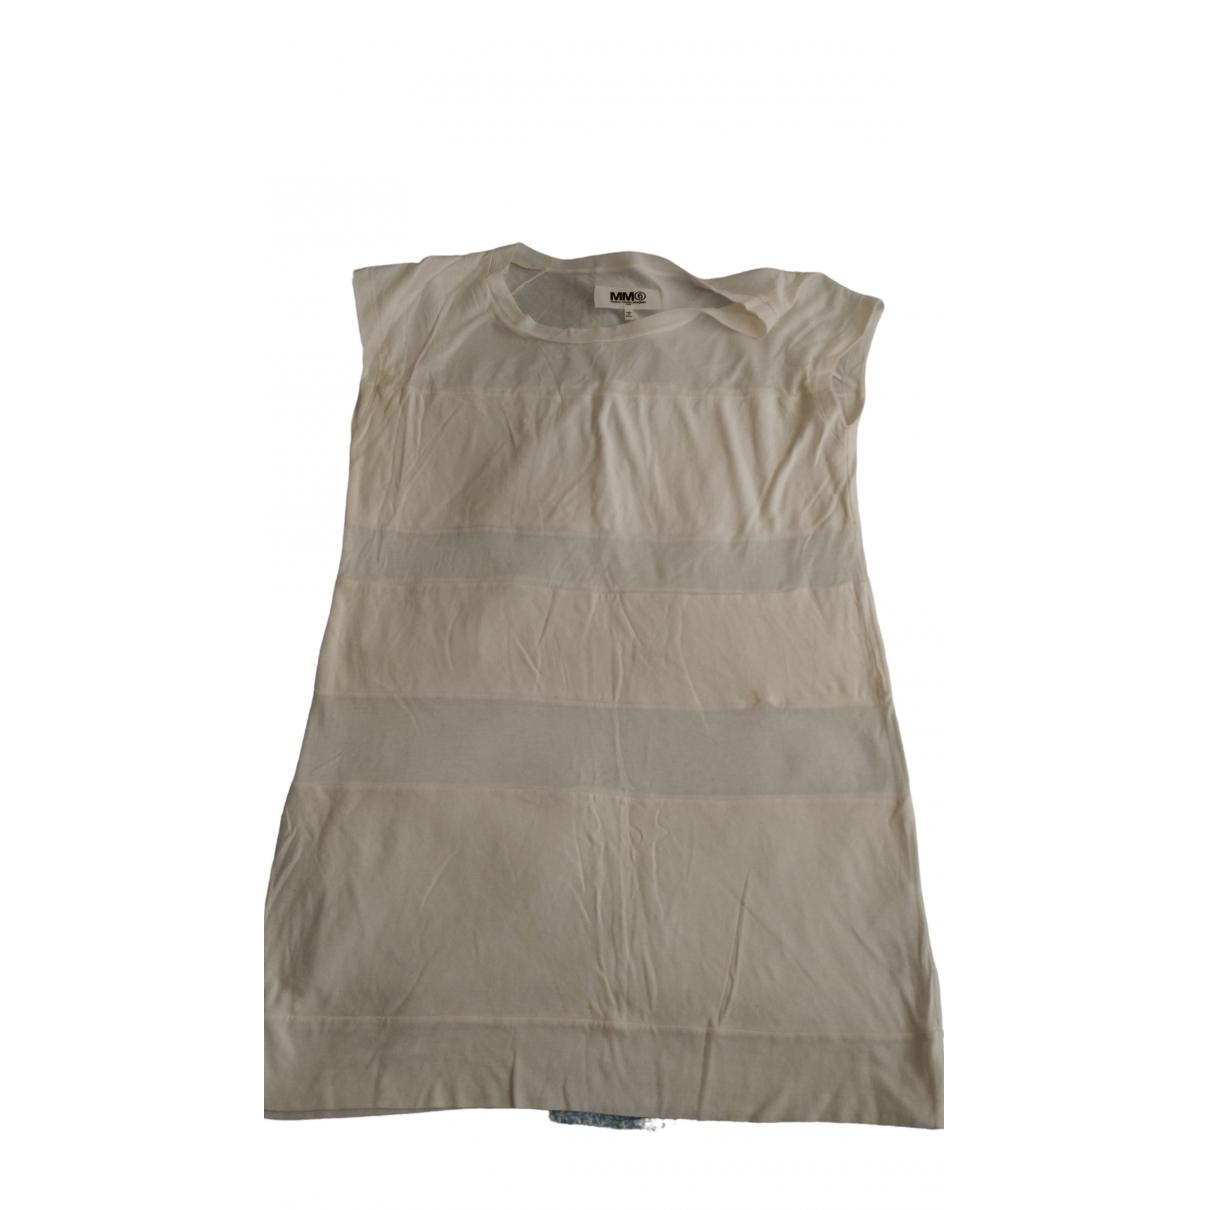 Mm6 \N Kleid in  Weiss Synthetik